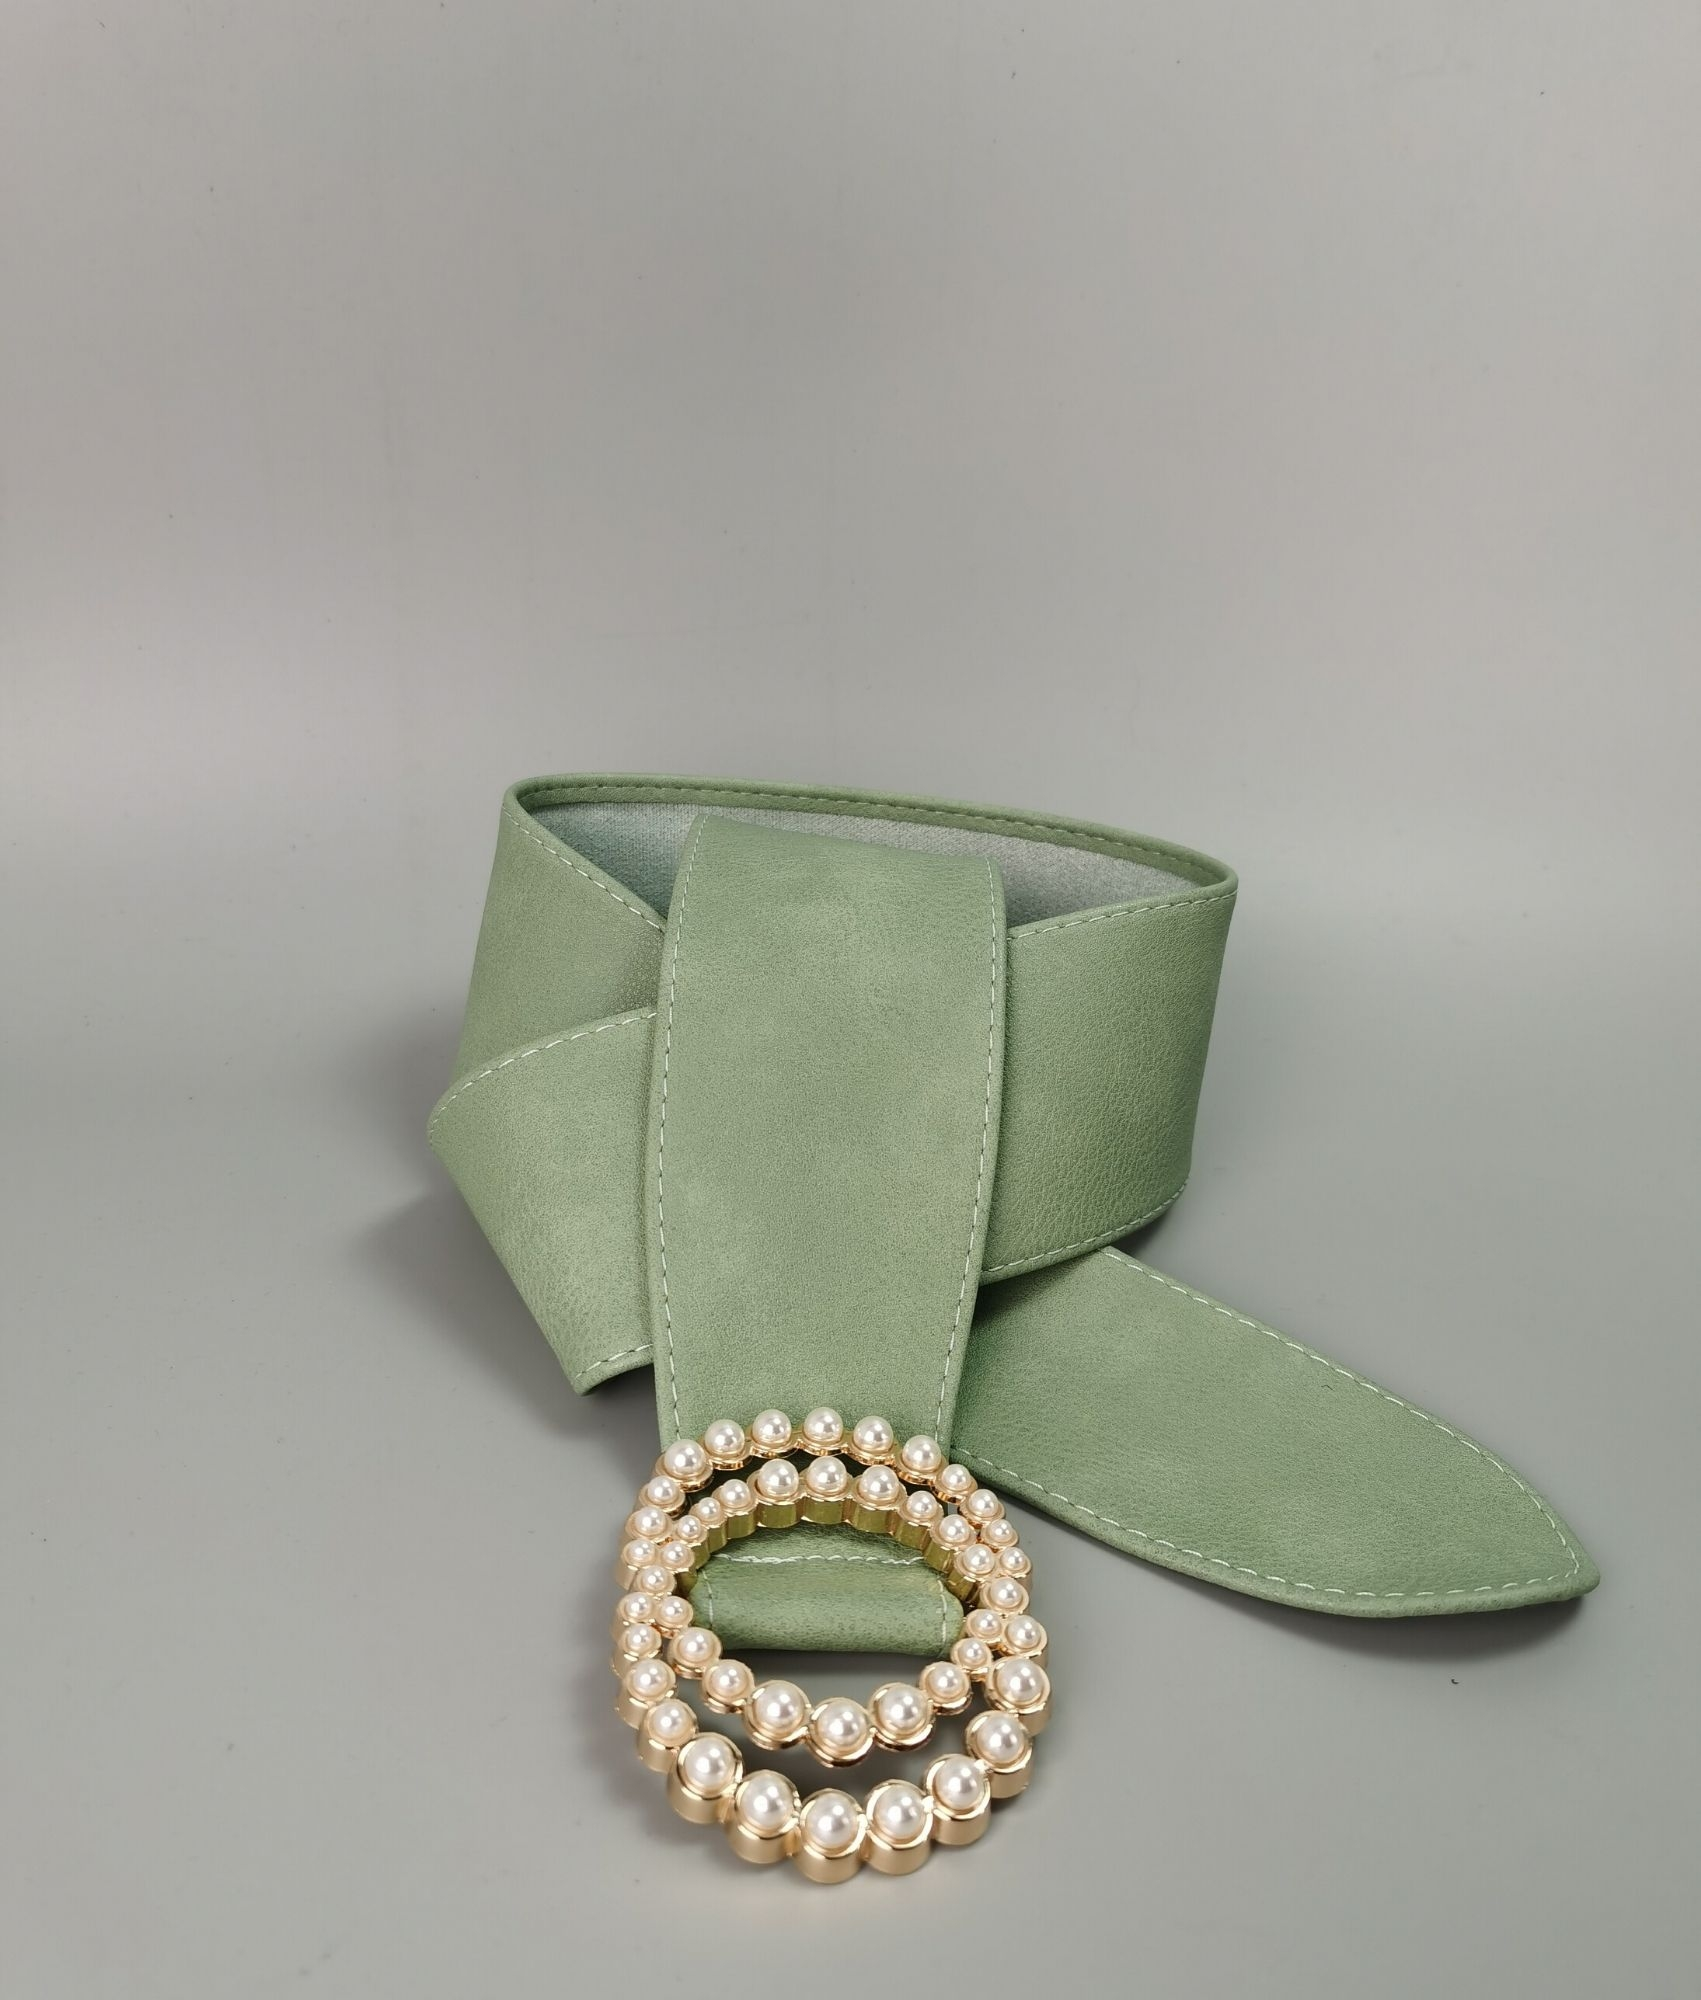 Belt Chanel - Green